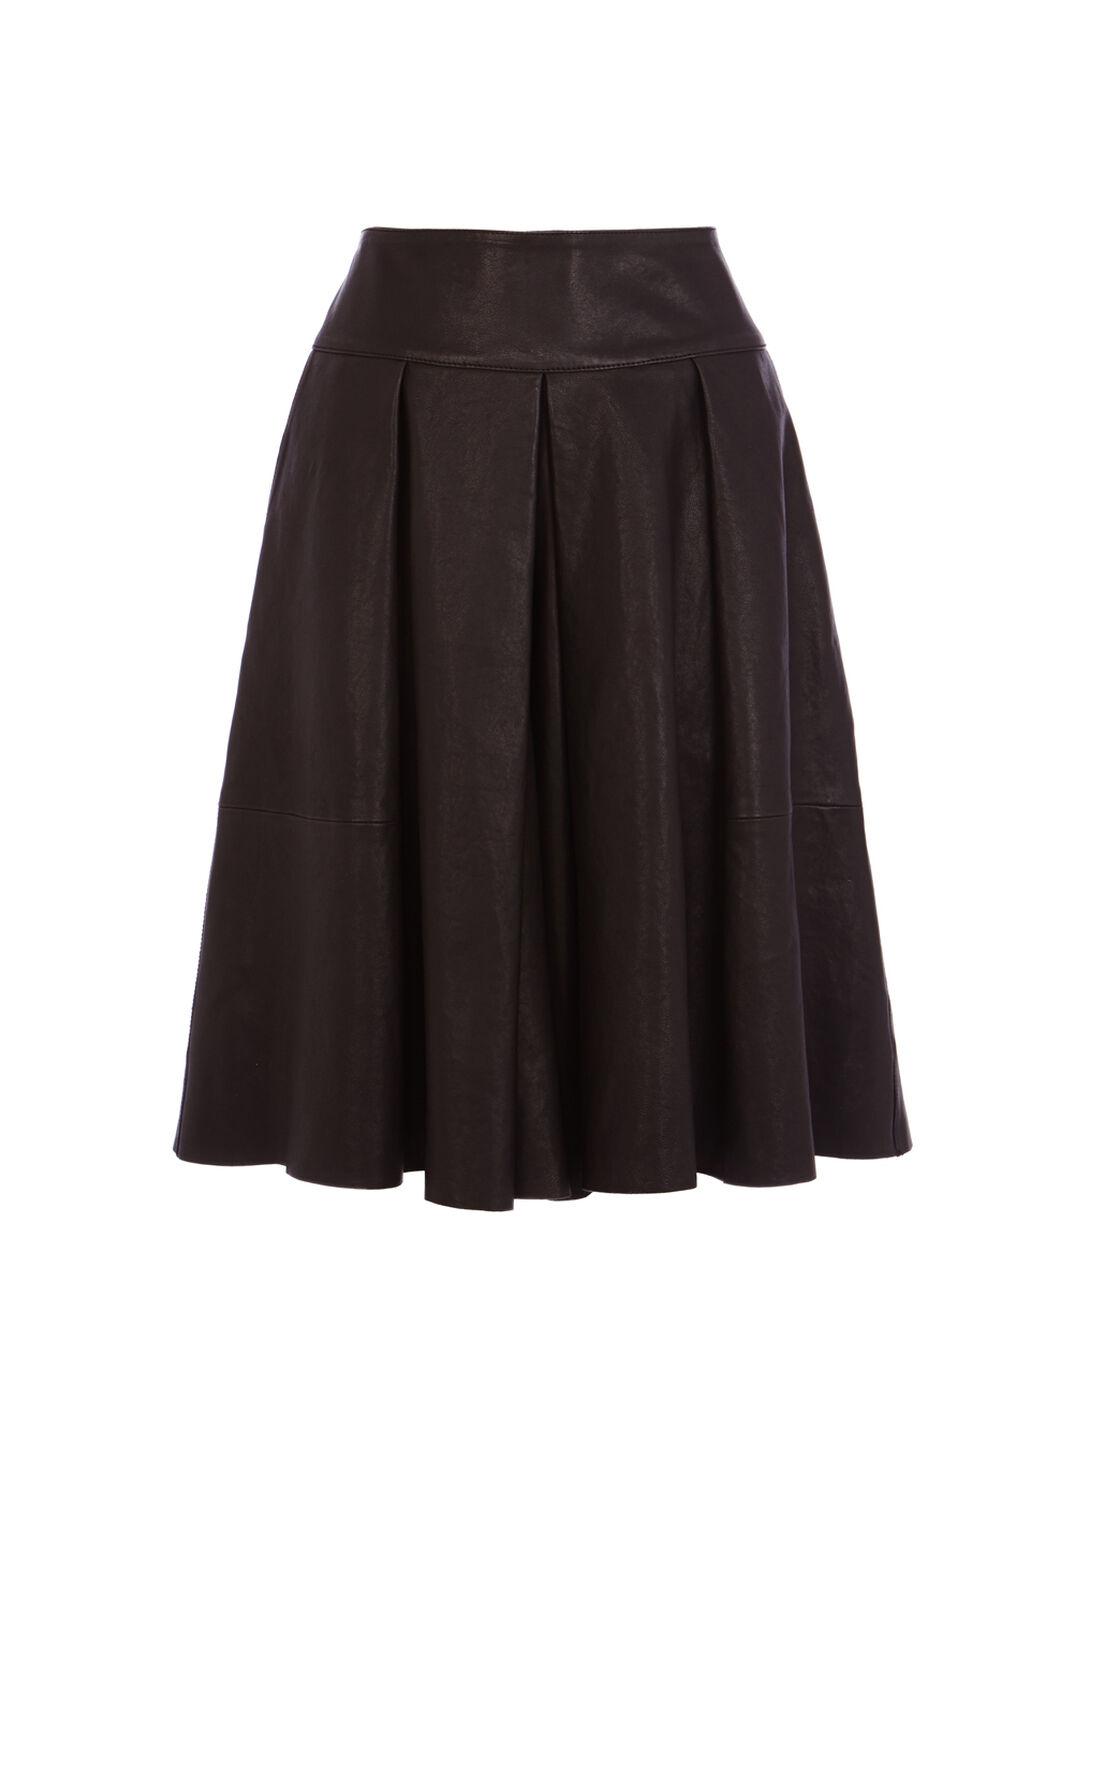 Karen Millen, Soft Leather Culotte Black 0